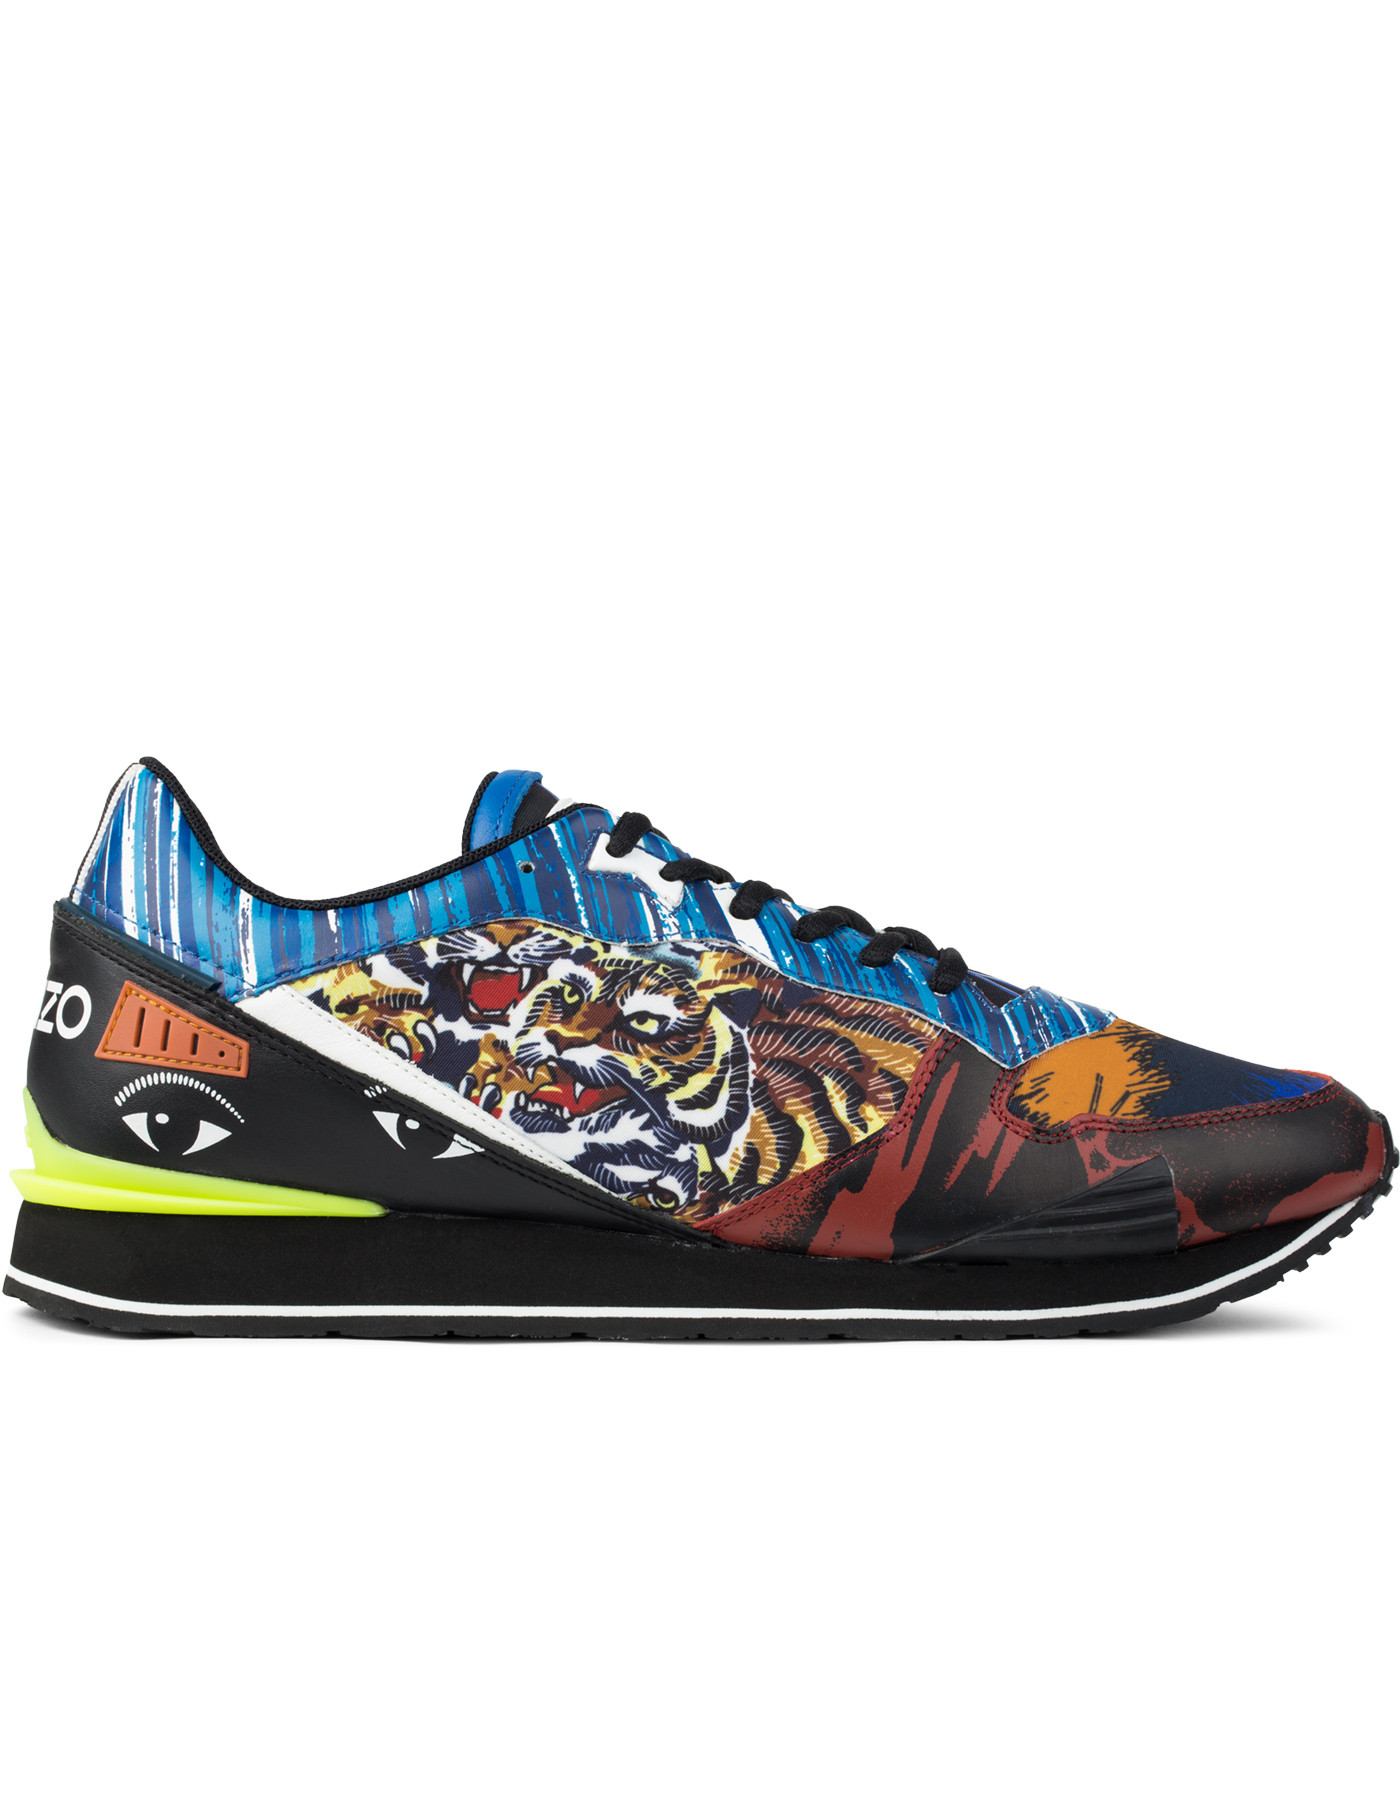 Kenzo - Running Crazy Tiger Sneakers   HBX